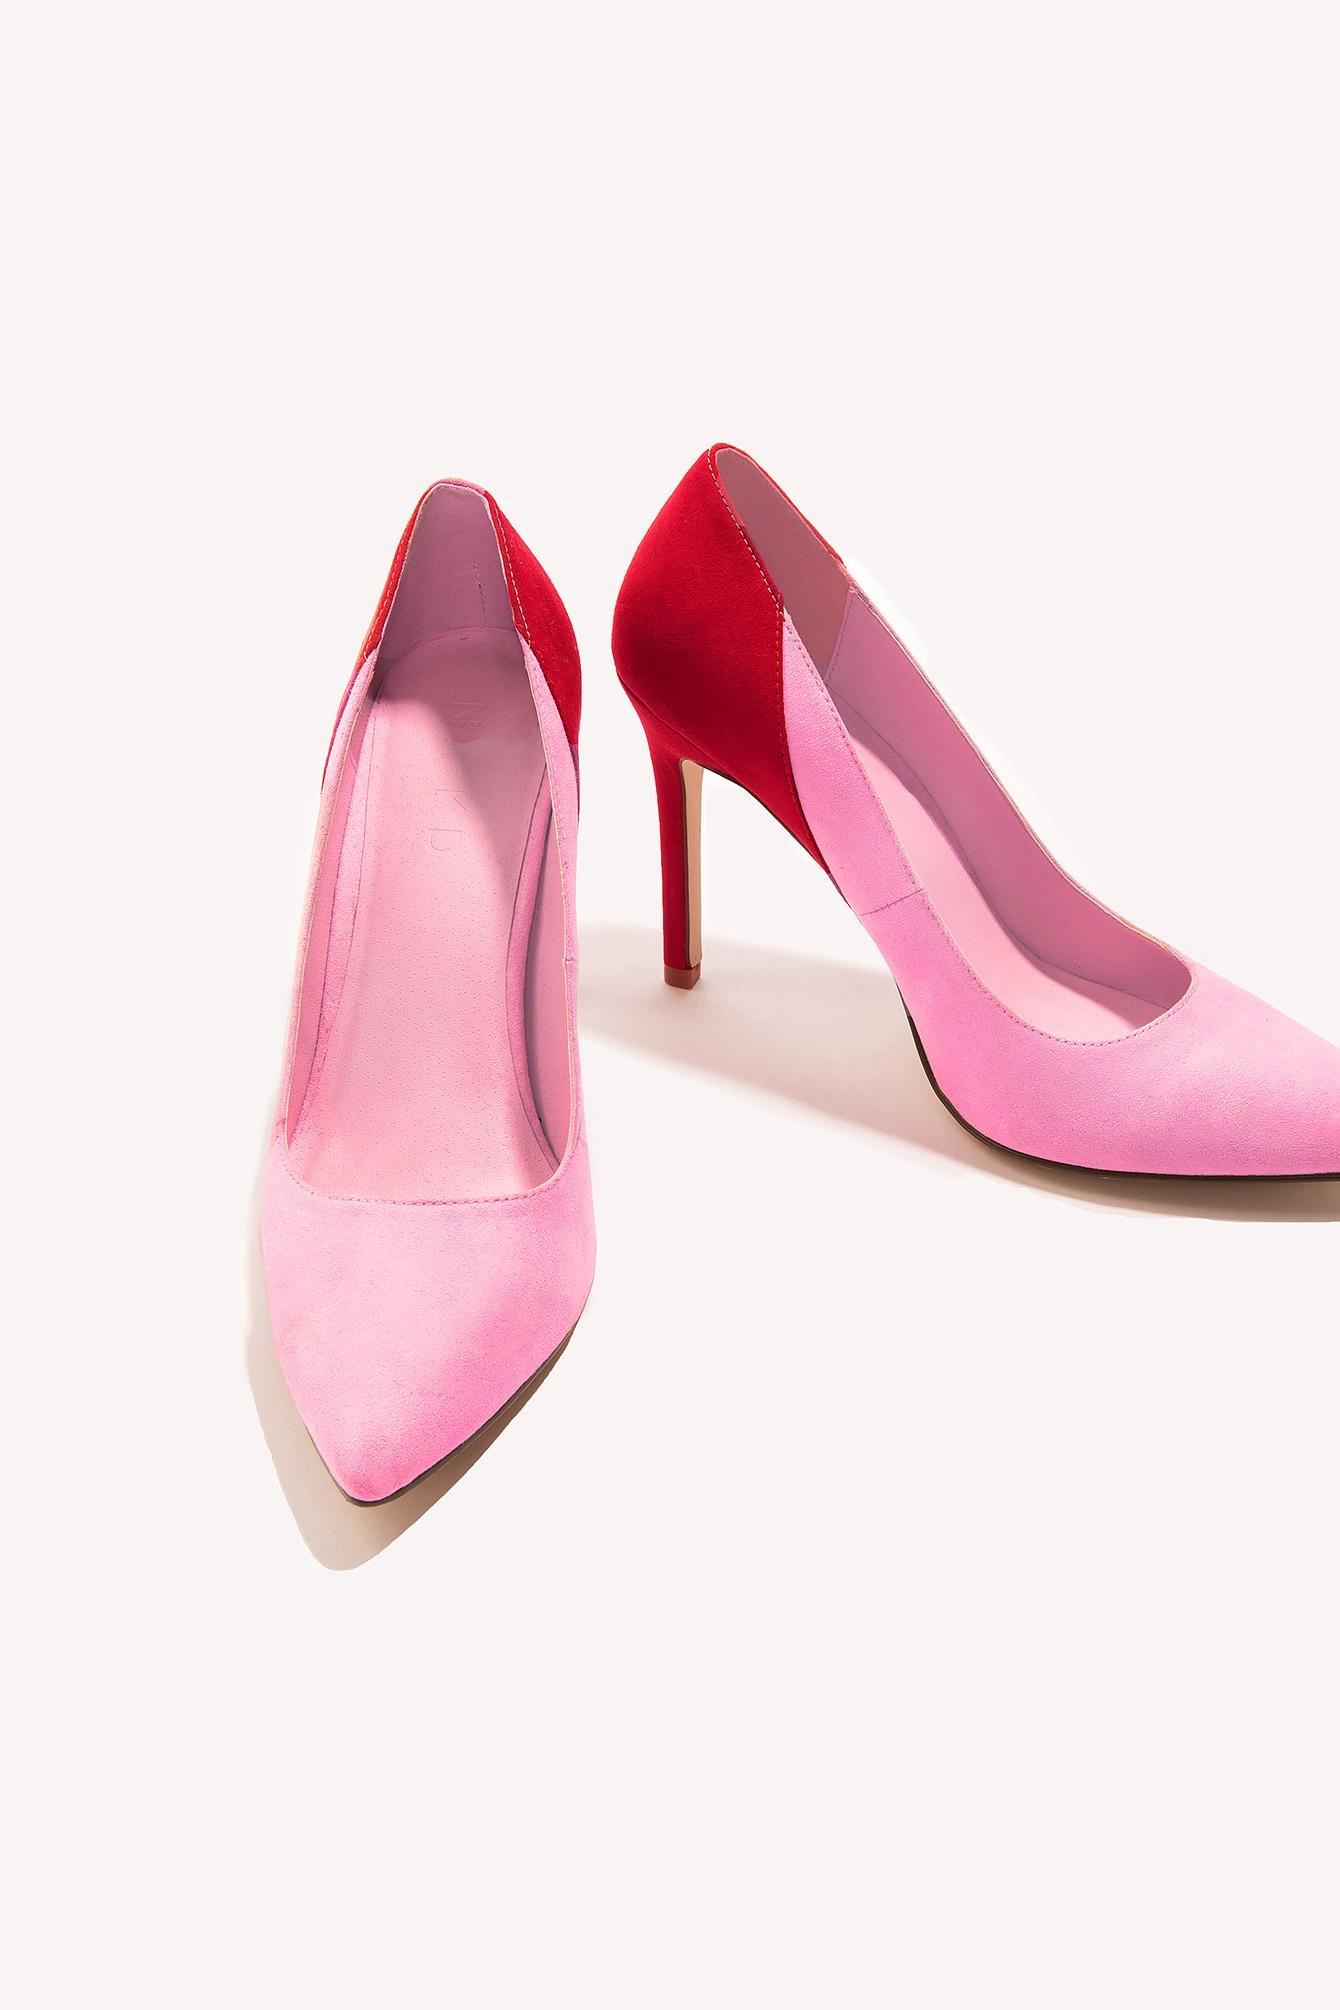 4fc1b09eb4 Block Color Mid Heel Pump Pink - The Block Color Mid Heel Pump by NA-